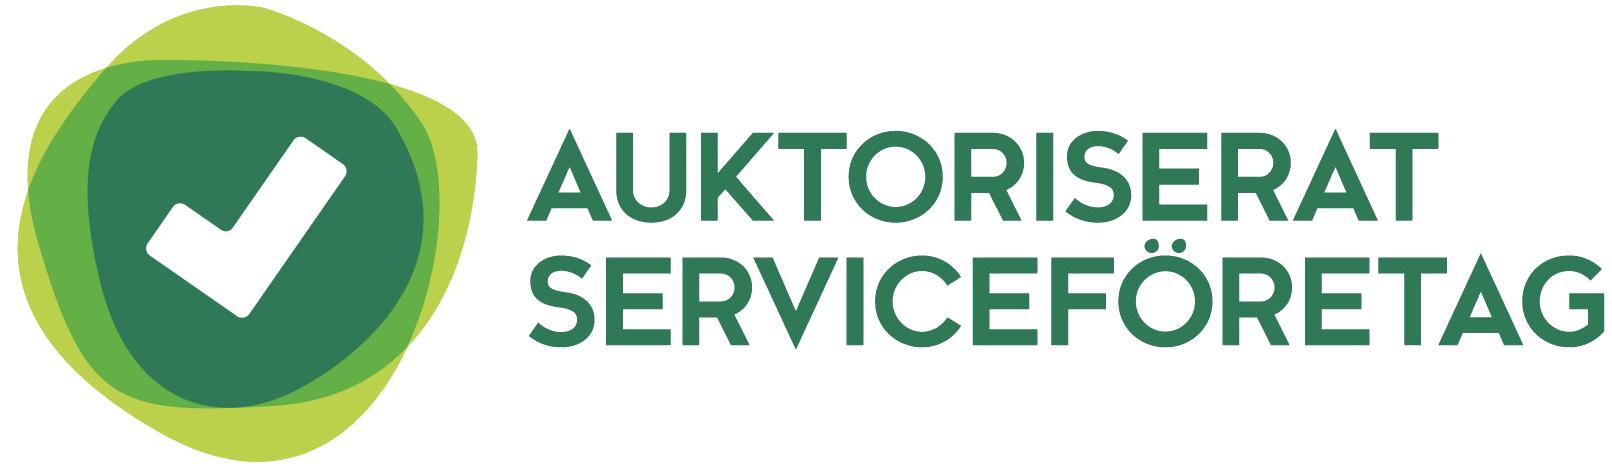 auktoriserat-serviceforetag